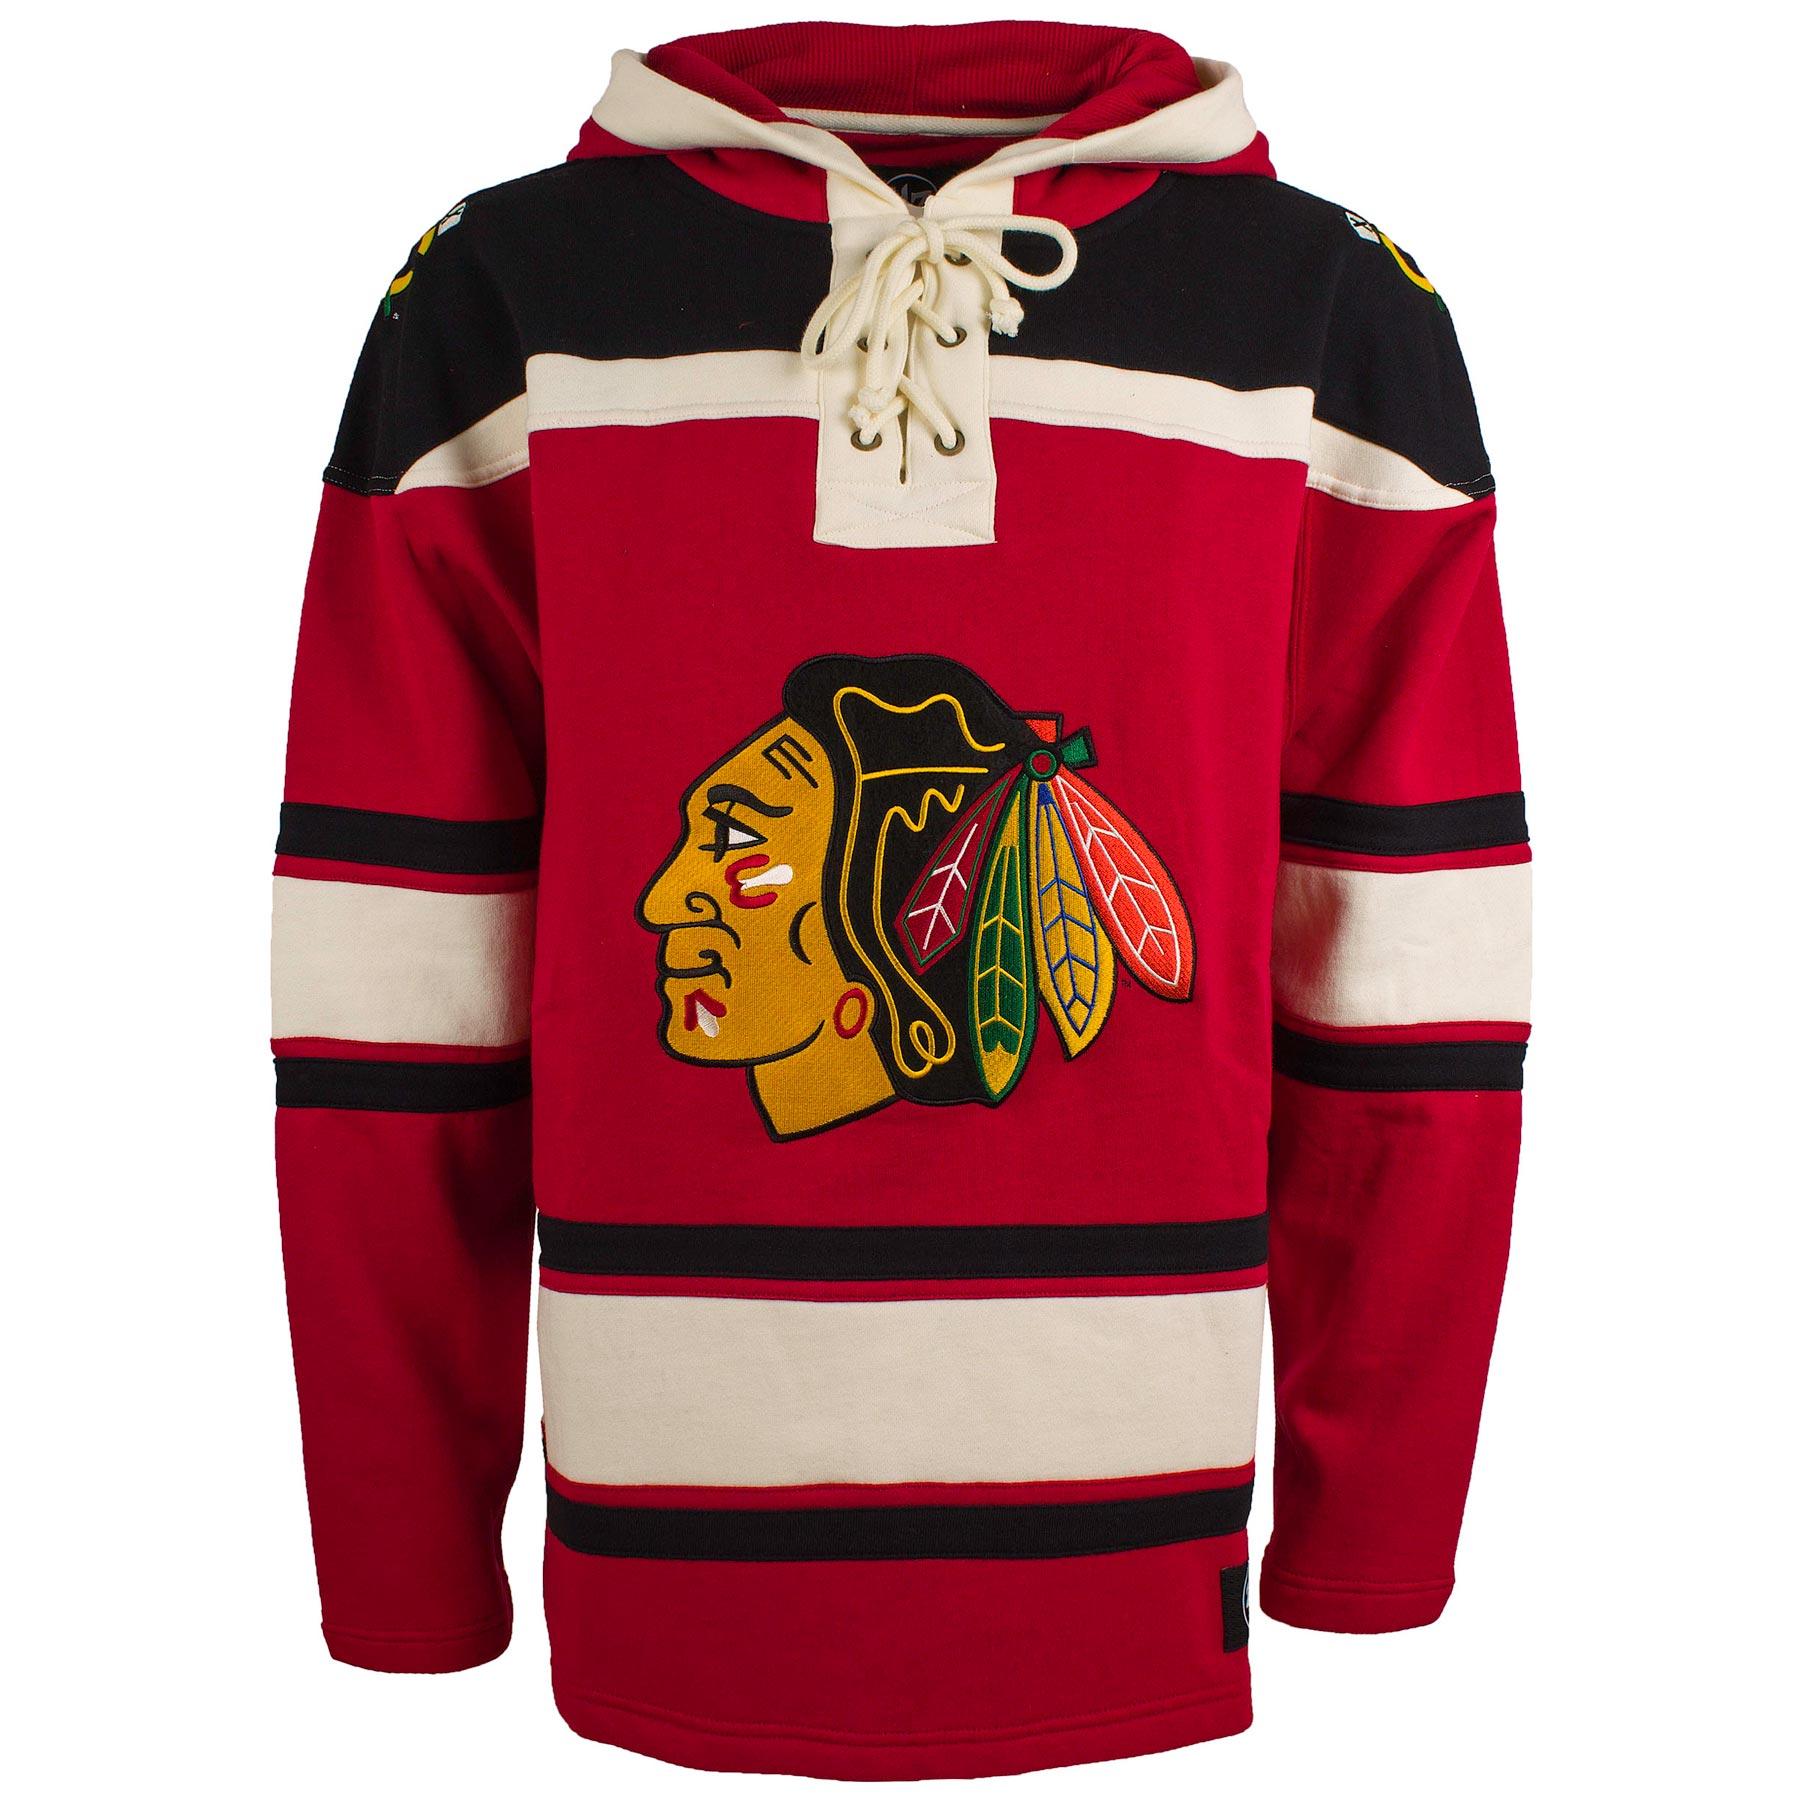 Chicago Blackhawks Old Time Hockey Lace Up Jersey Hooded Sweatshirt 0fdb9de2672